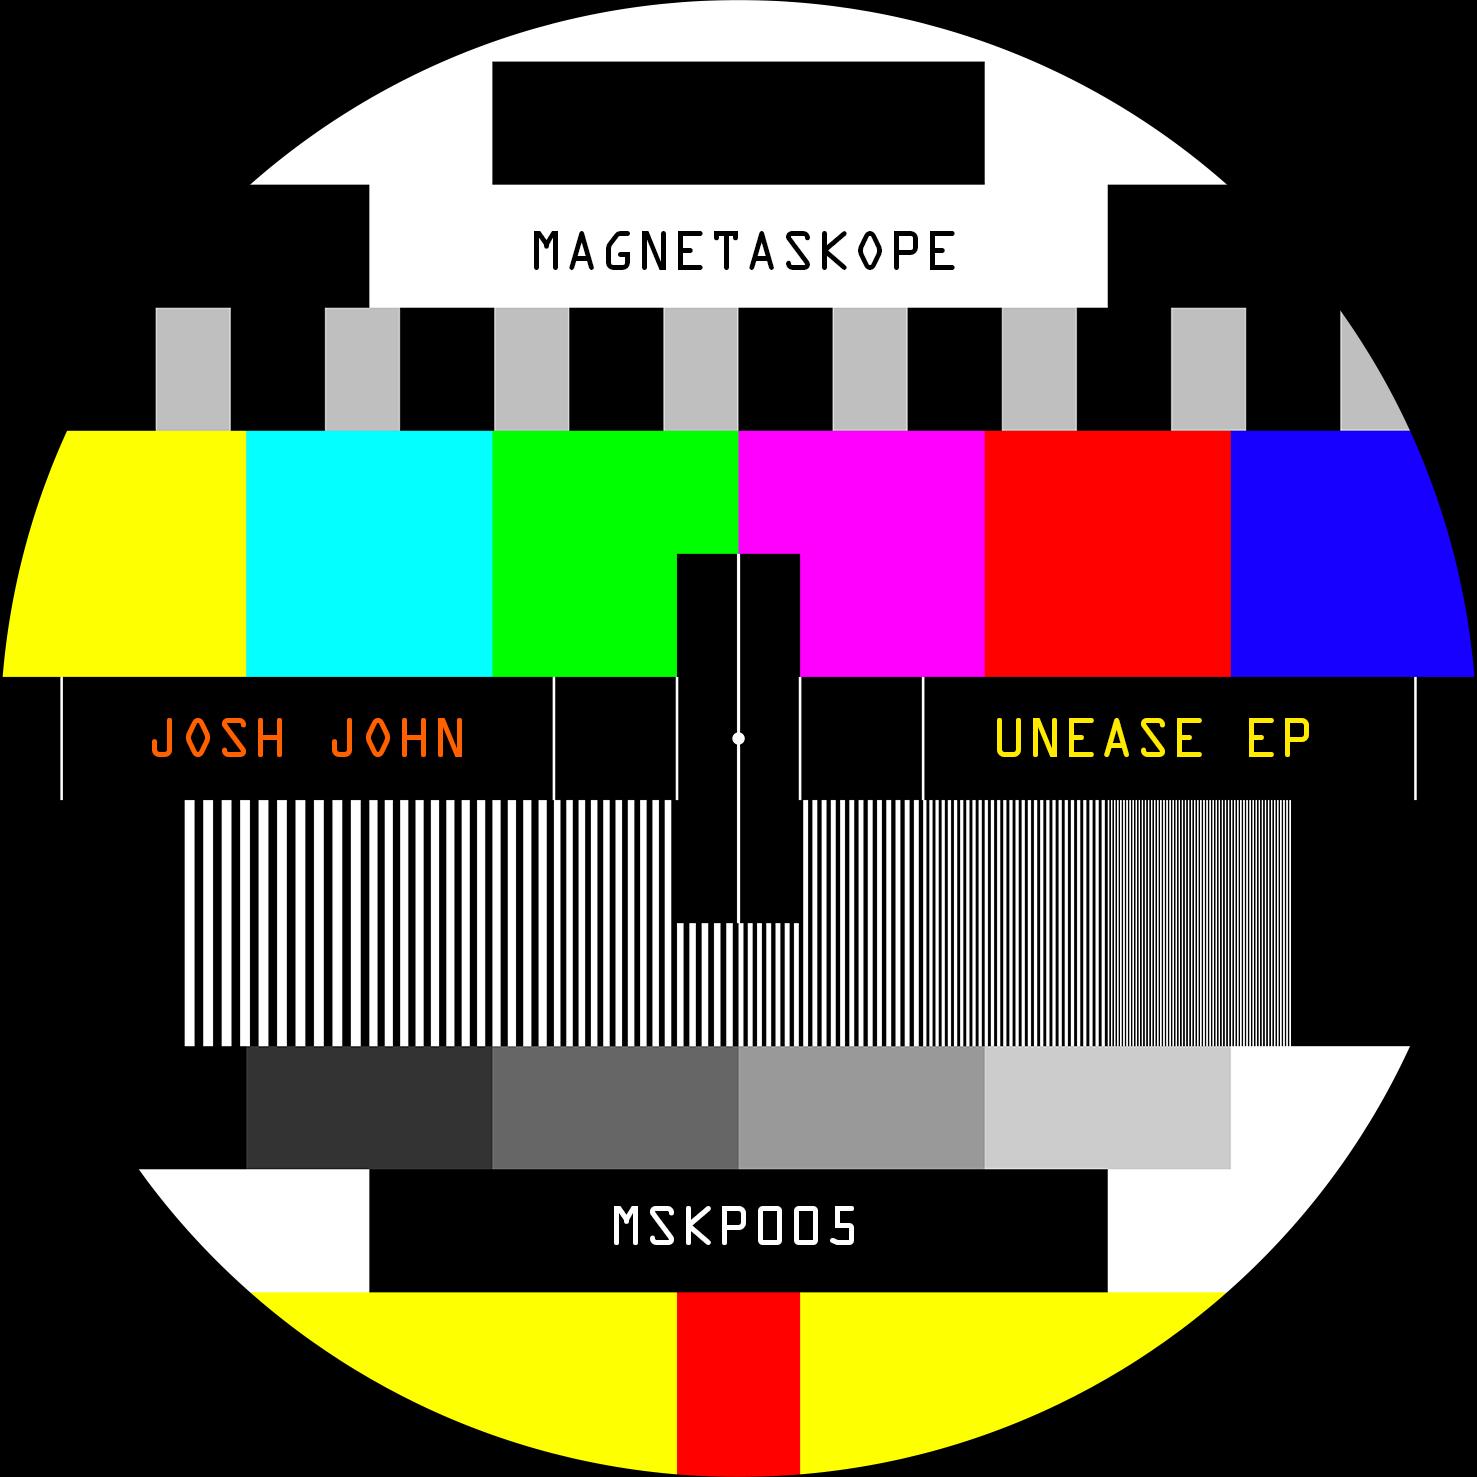 MSKP005 - JOSH JOHN // UNEASE EPRELEASED 01.30.2019